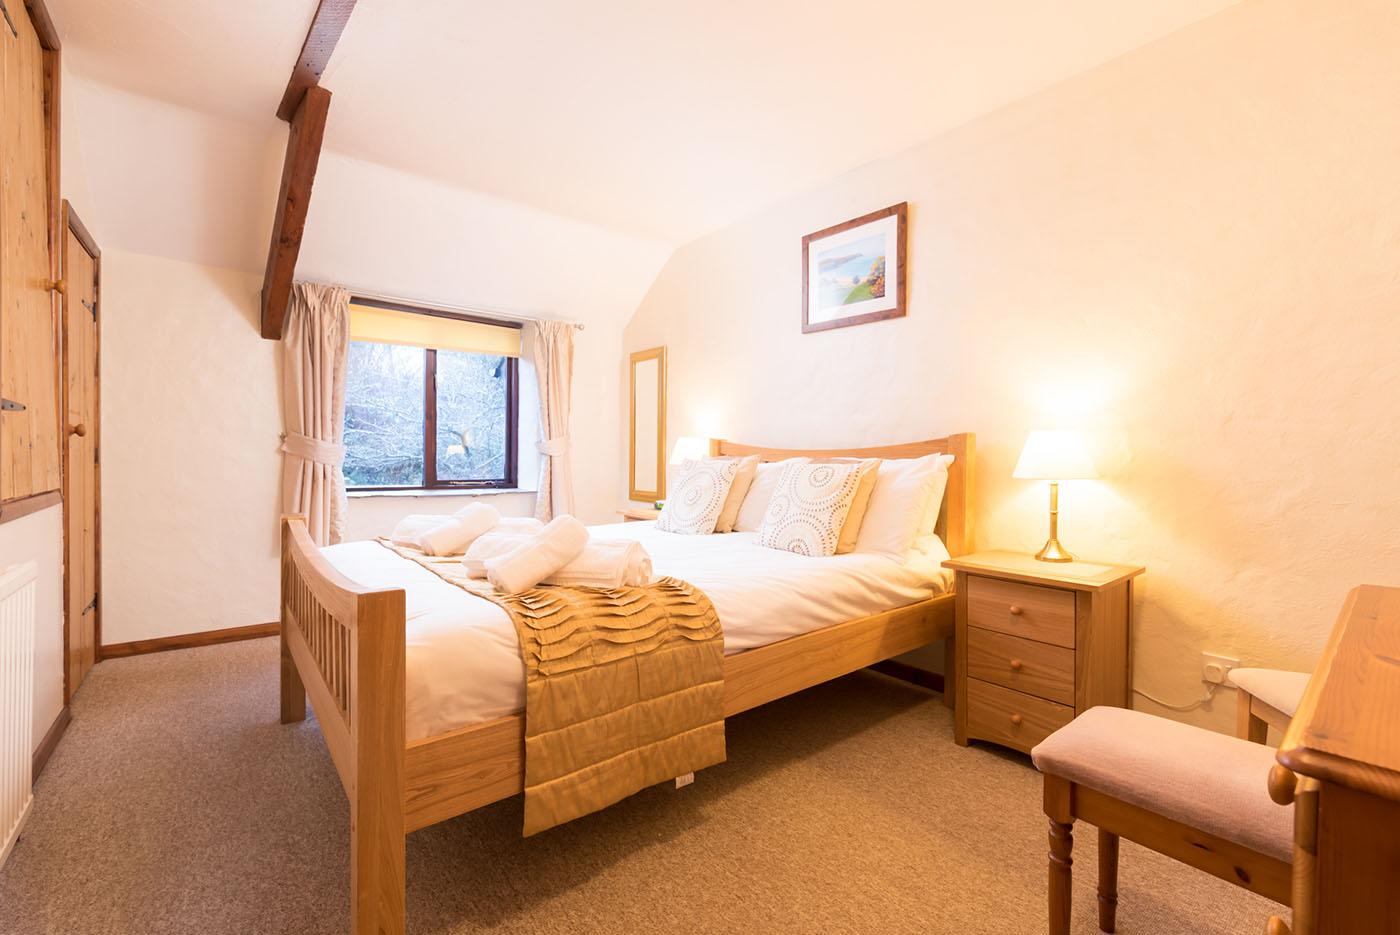 Hayloft bedroom